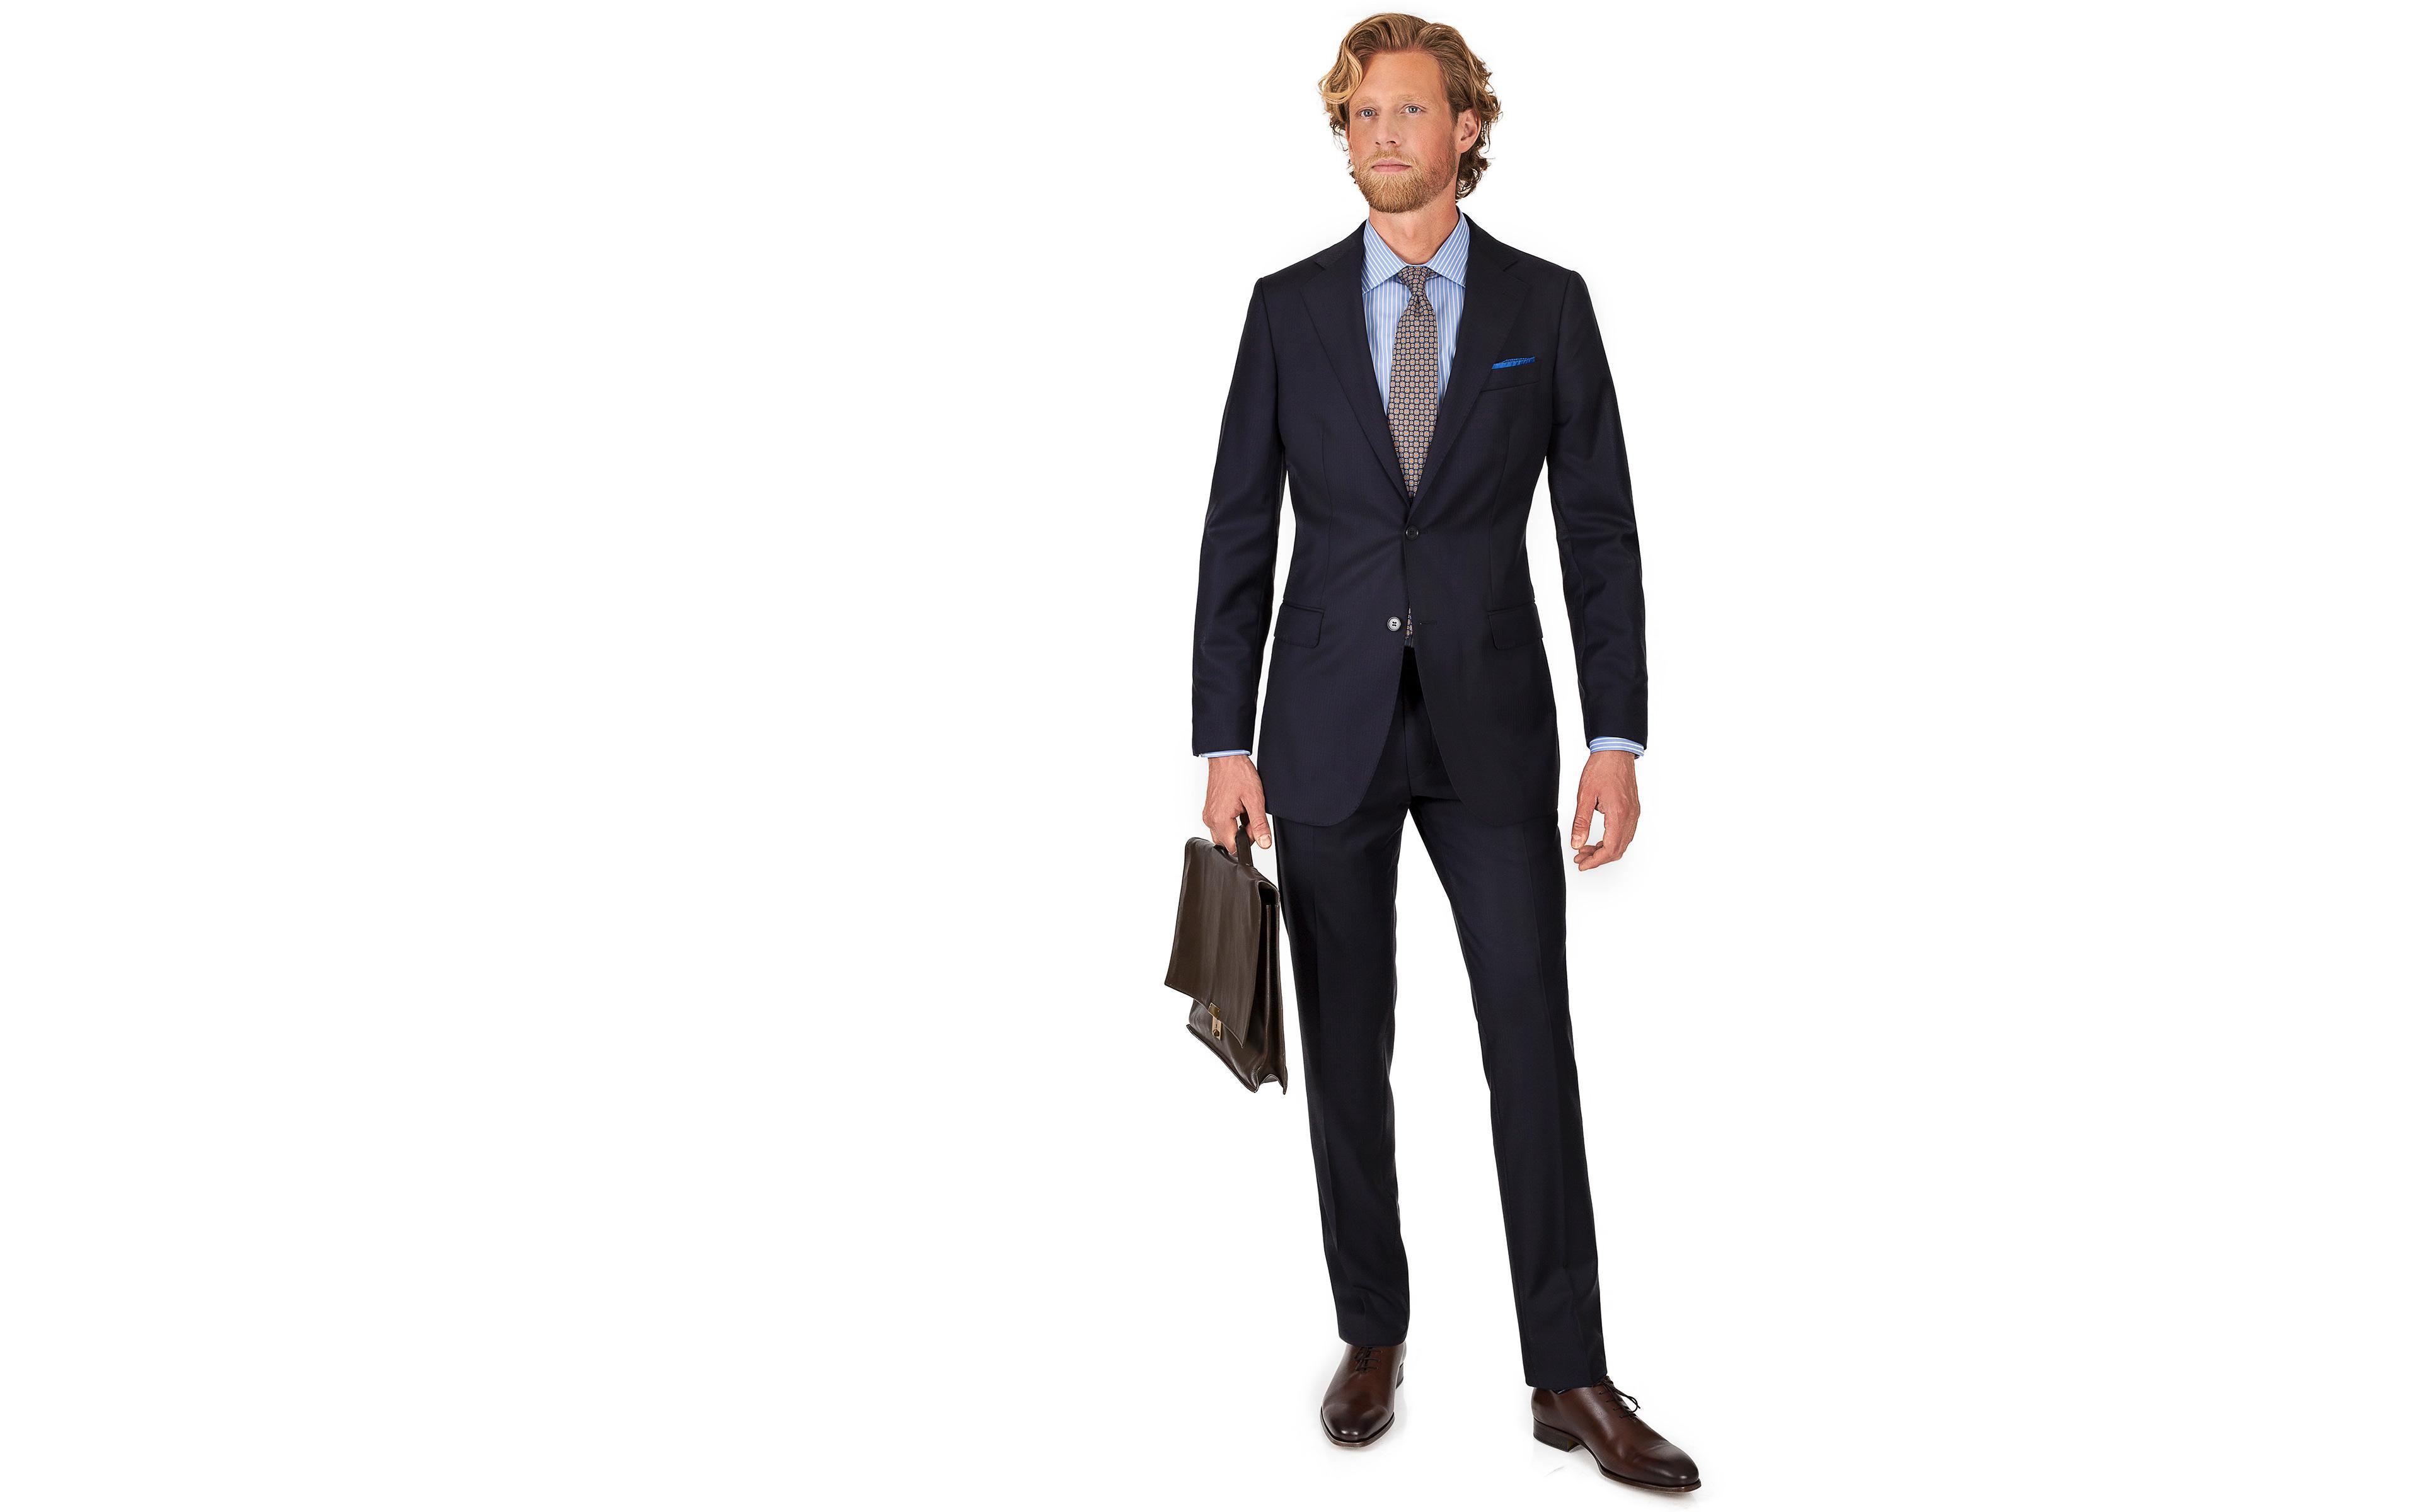 Suit in Dark Navy Wool